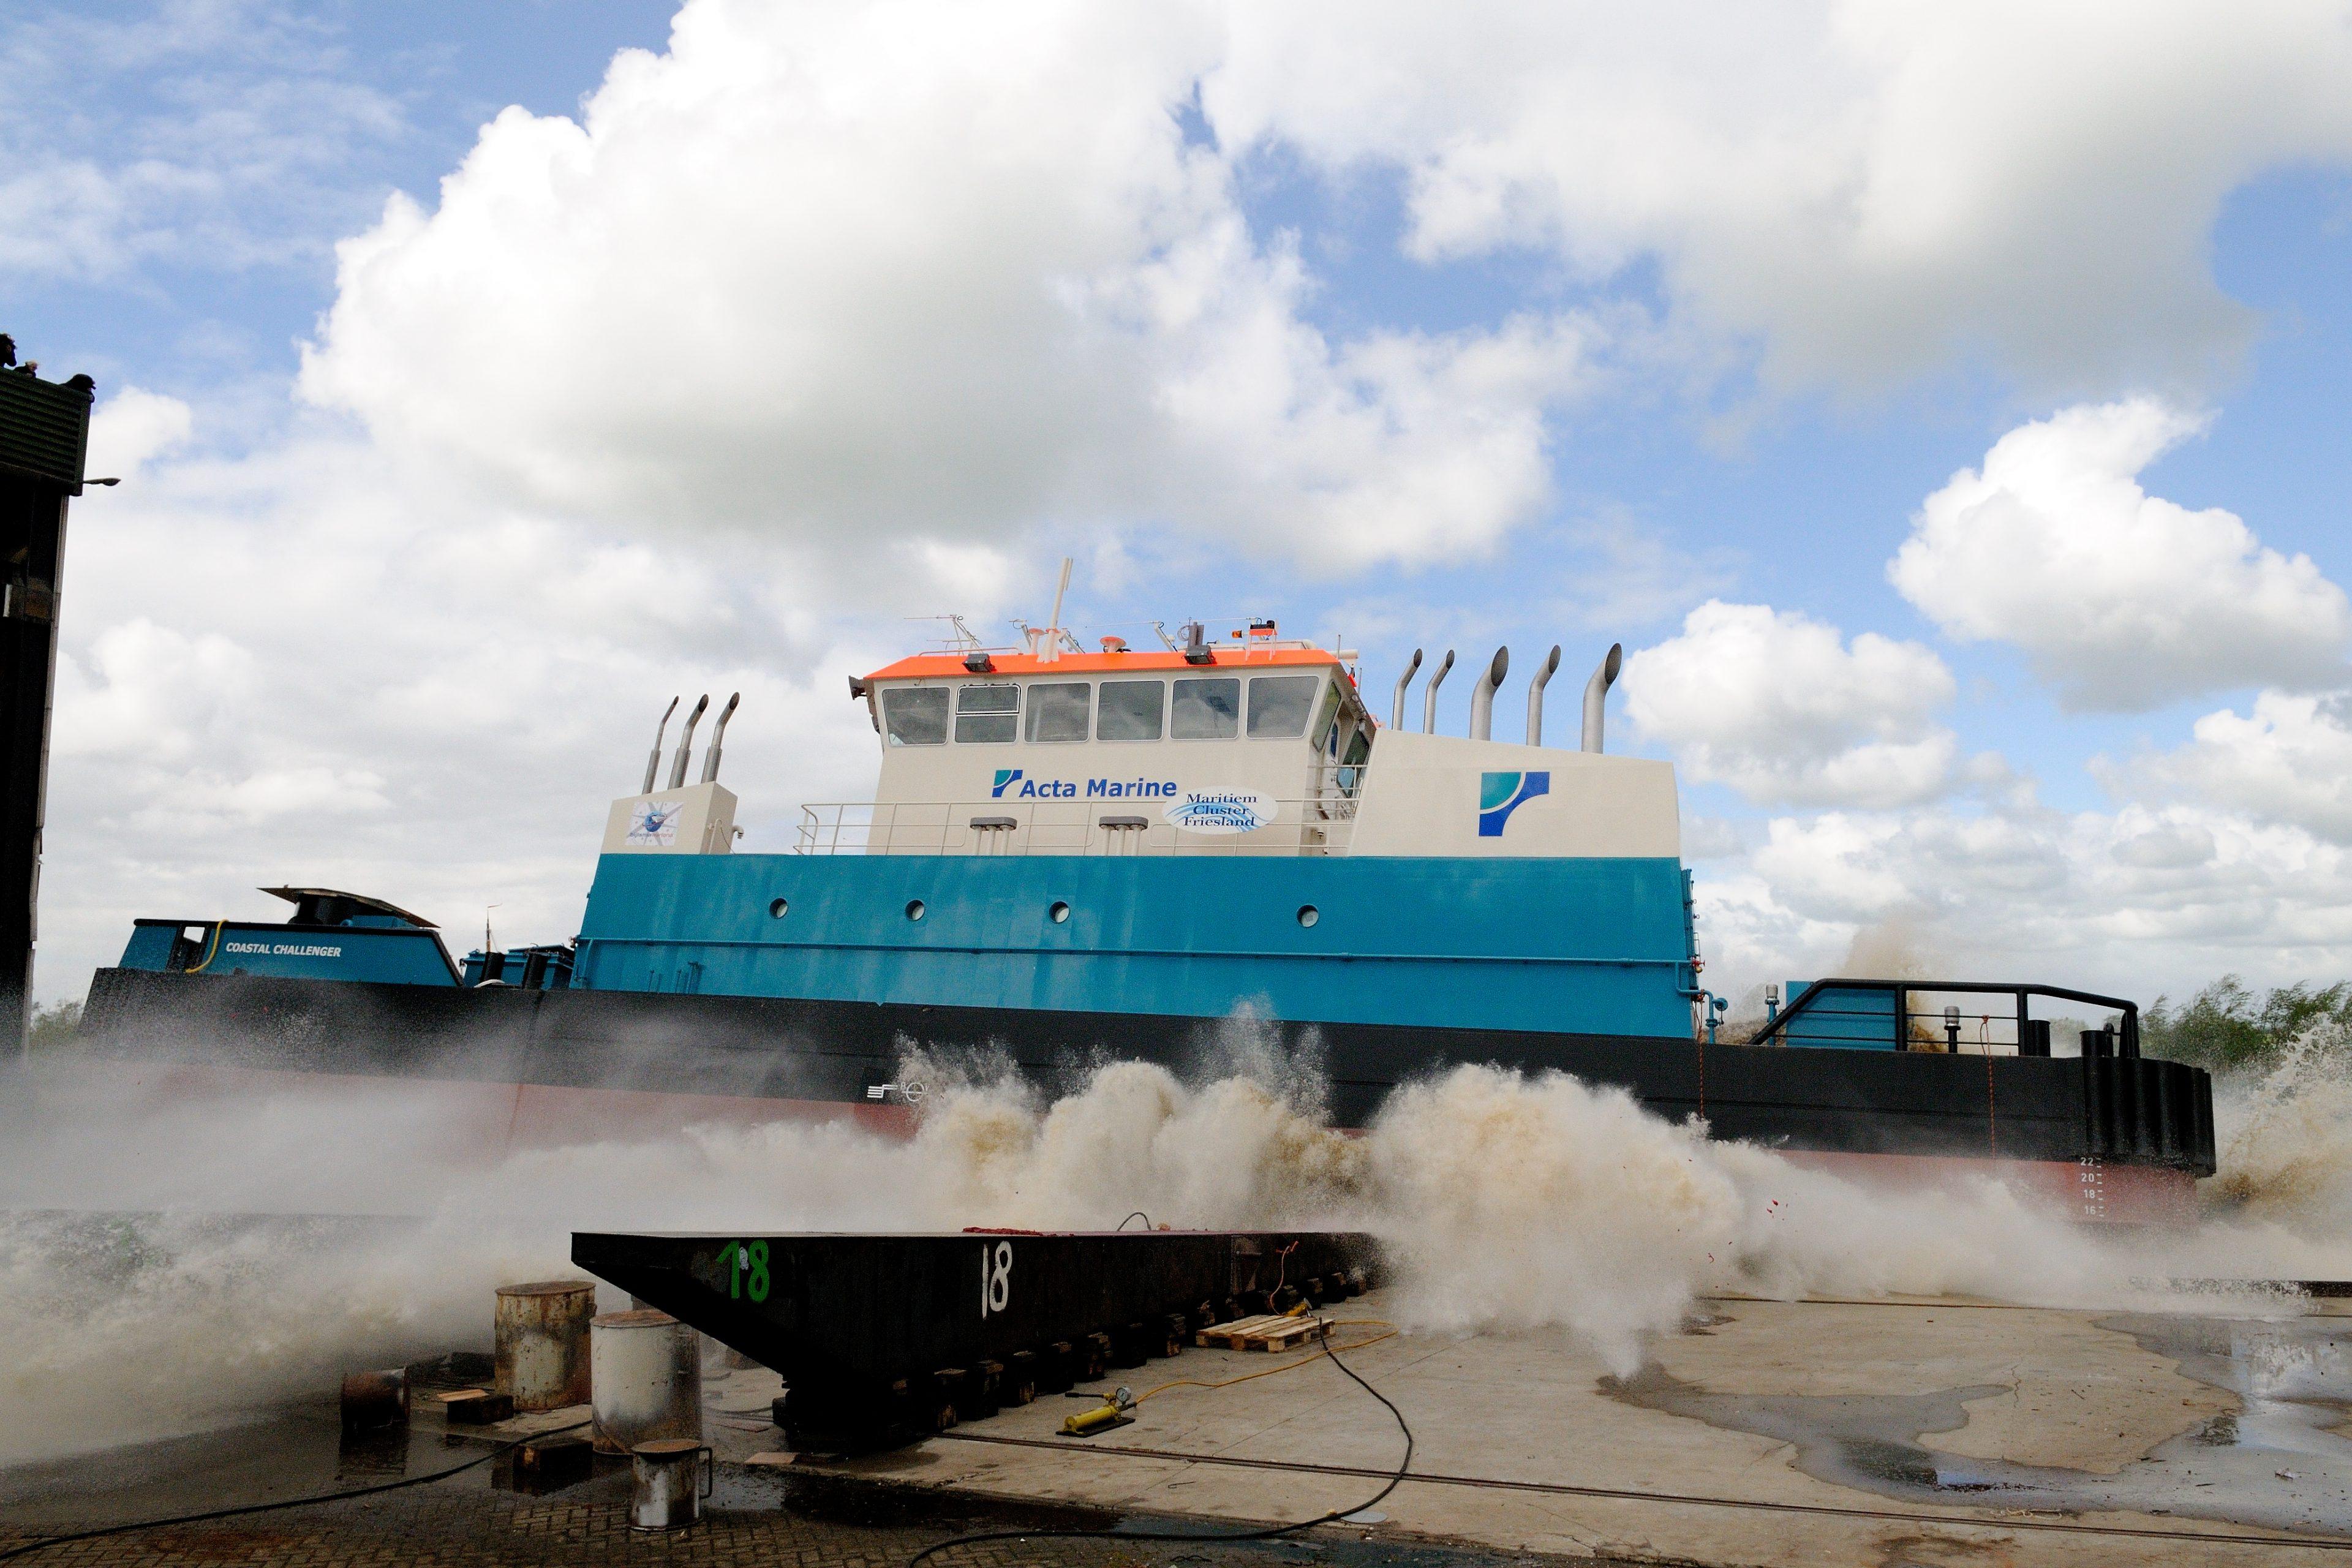 Tewaterlating Acta marine coastal challenger